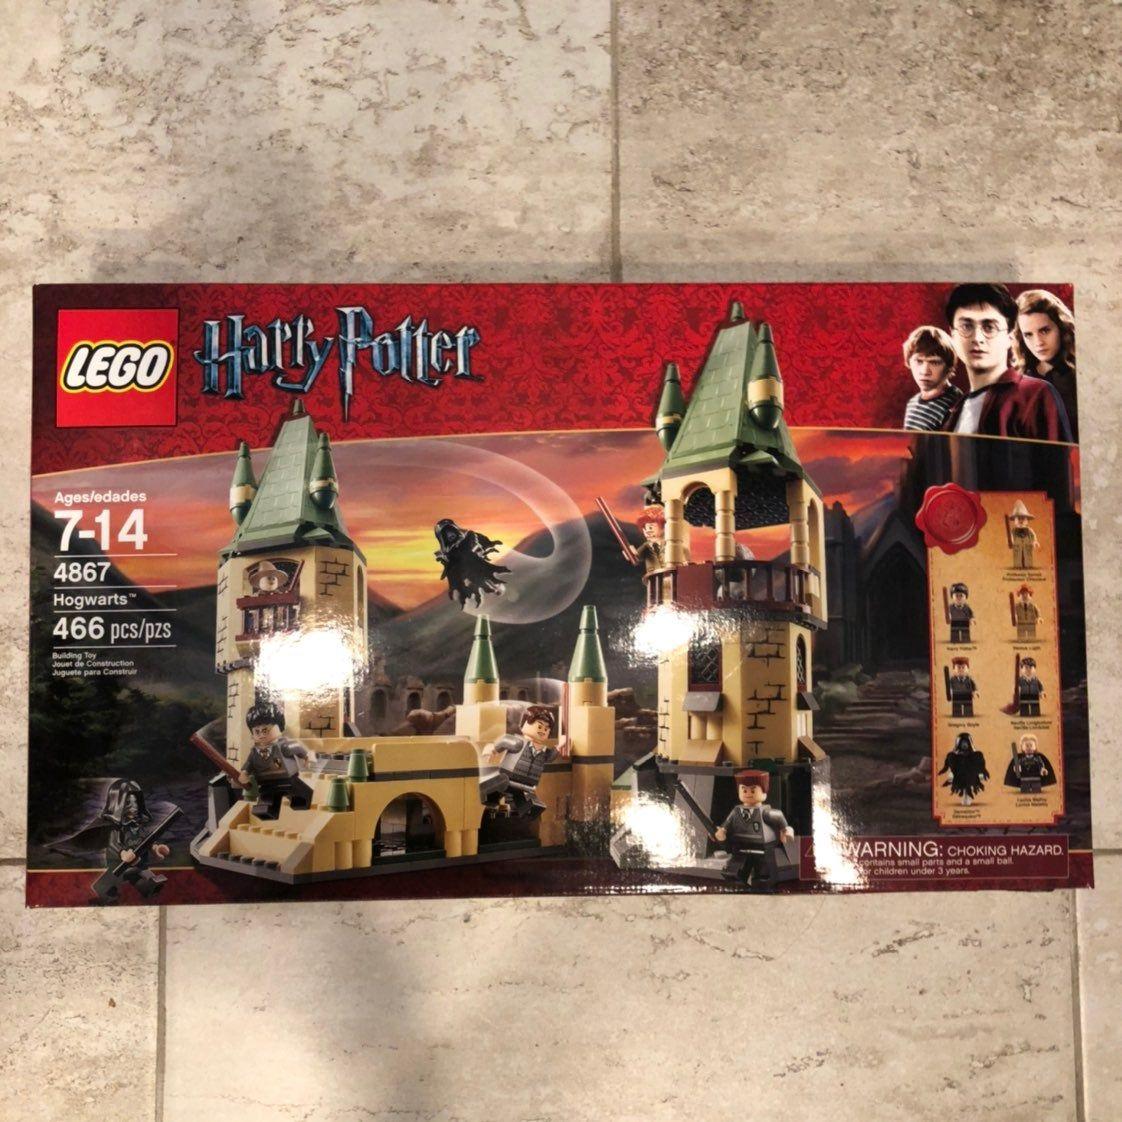 Brand New Lego Harry Potter Hogwarts 4867 In Box Unopened No Longer Made Lego Harry Potter Harry Potter Hogwarts Harry Potter Fantastic Beasts